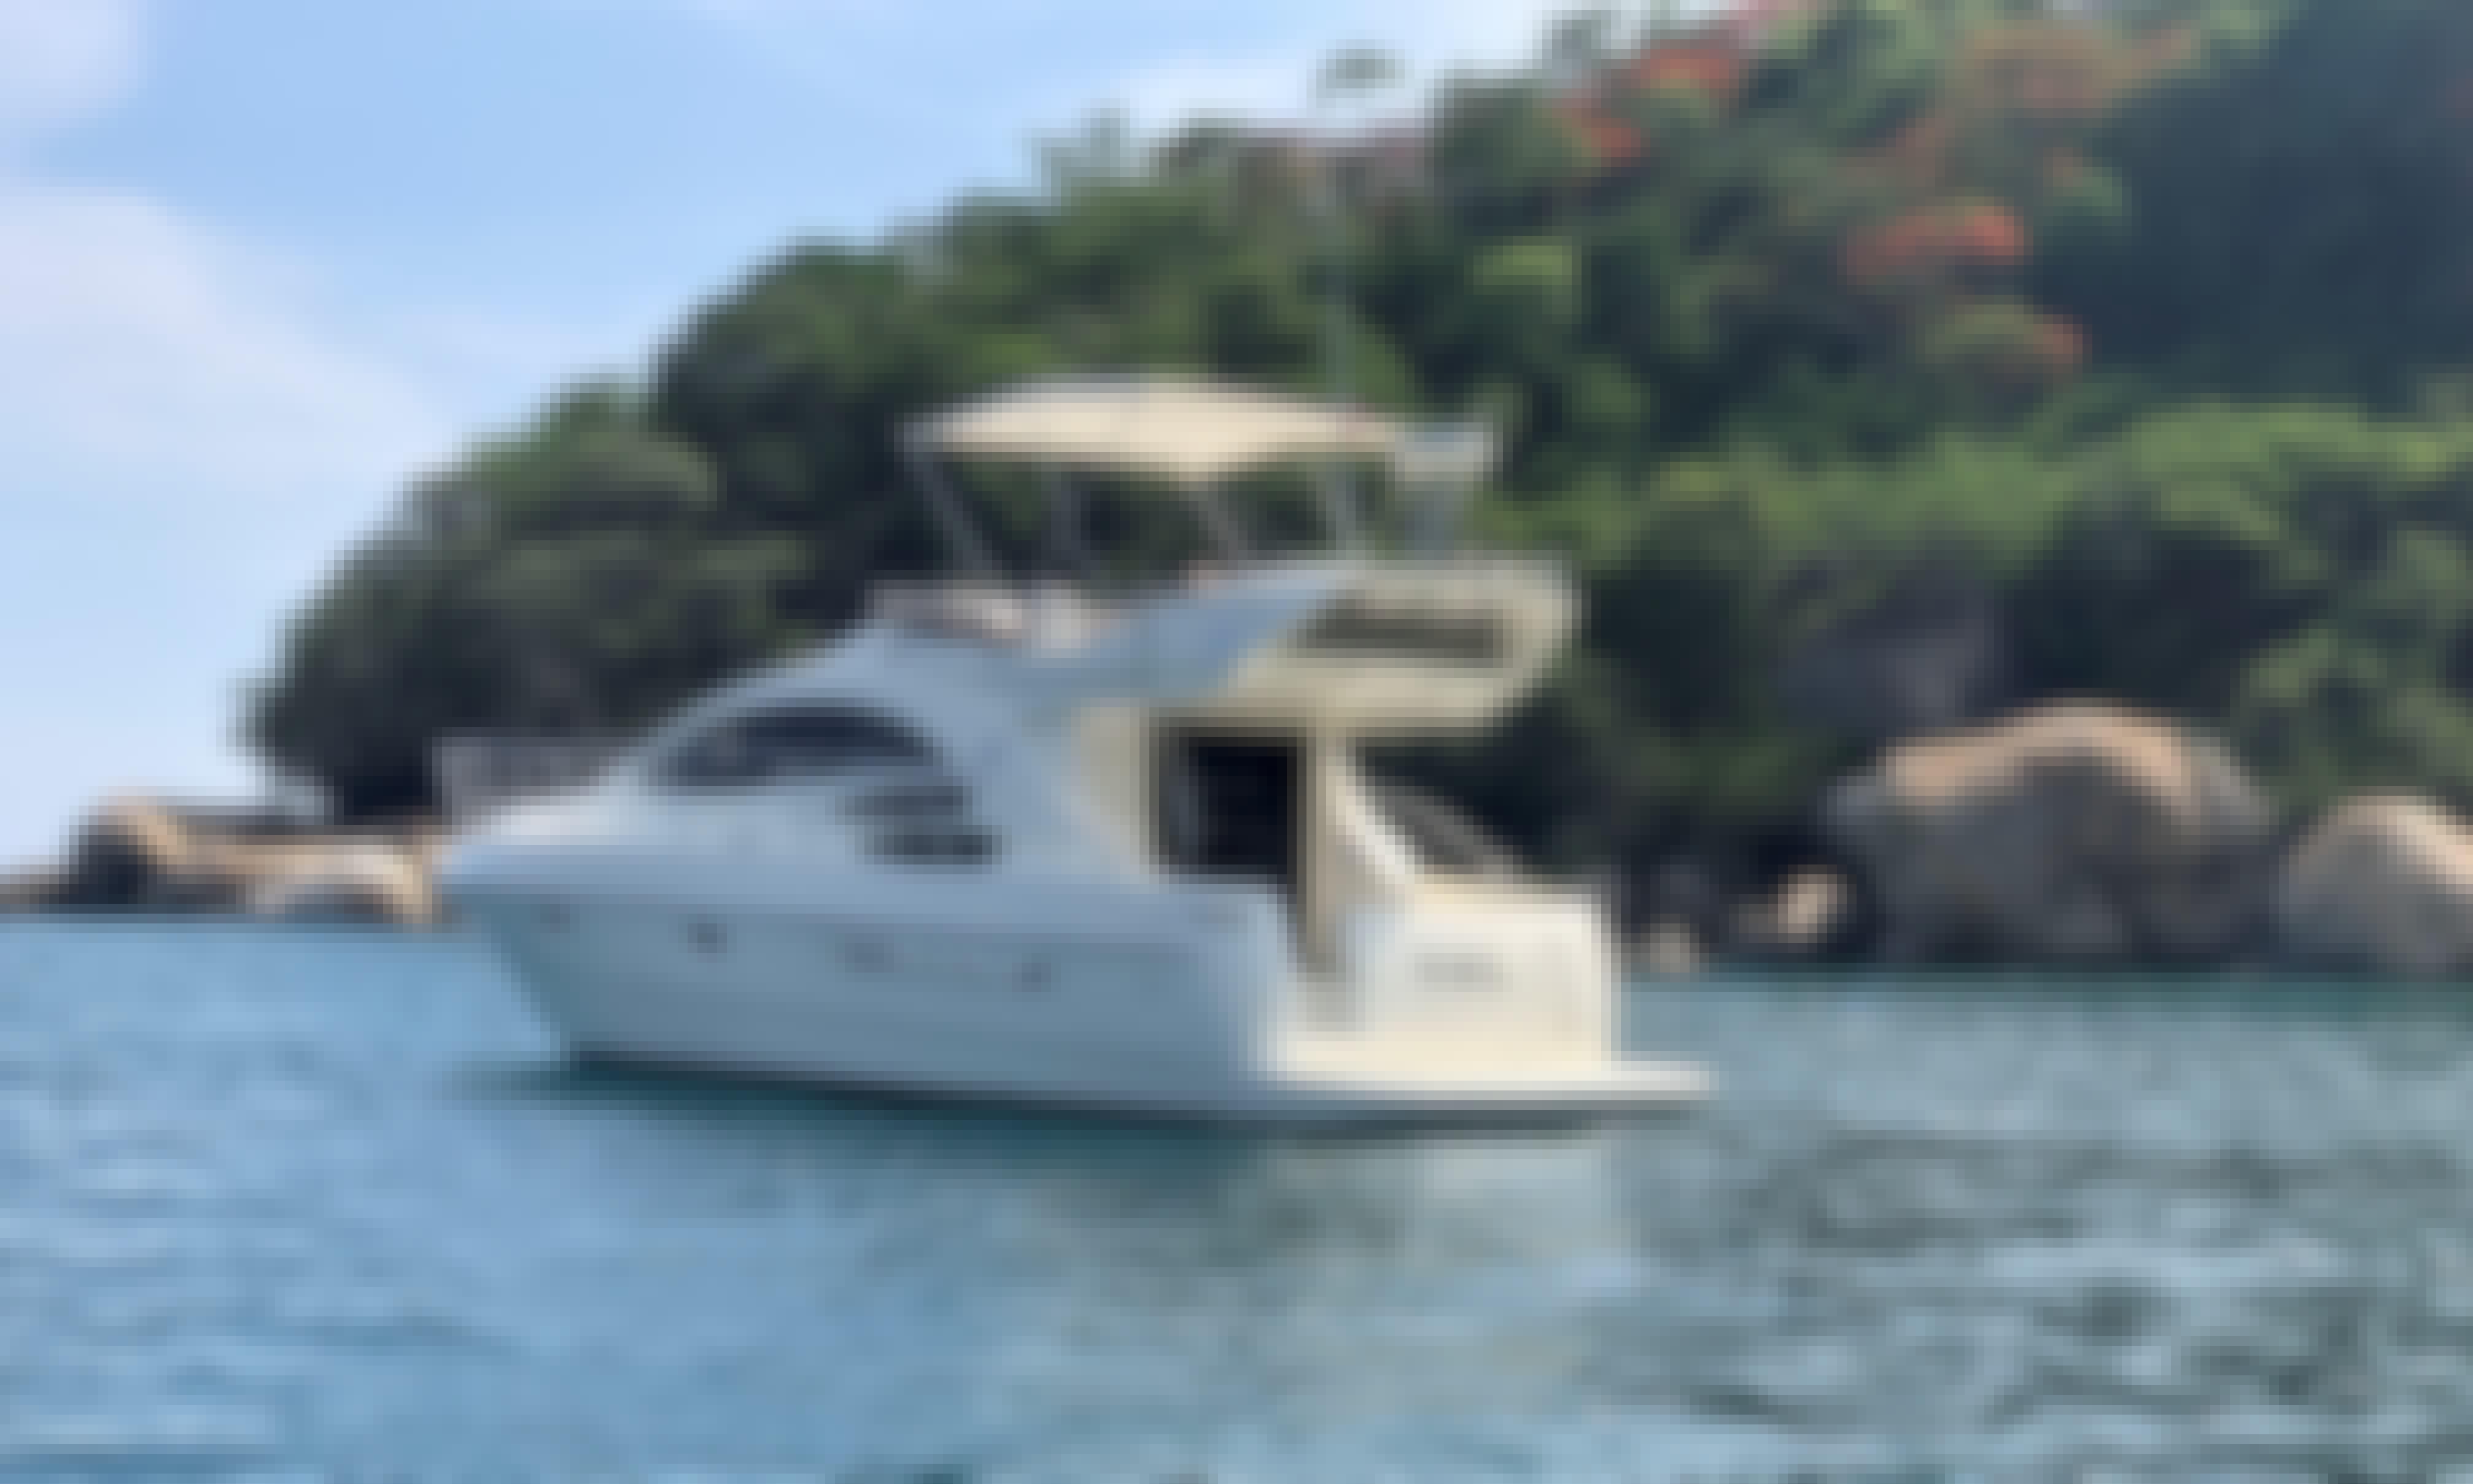 Captained Charter on 39' Azimut Motor Yatch in Acapulco de Juárez, Guerrero